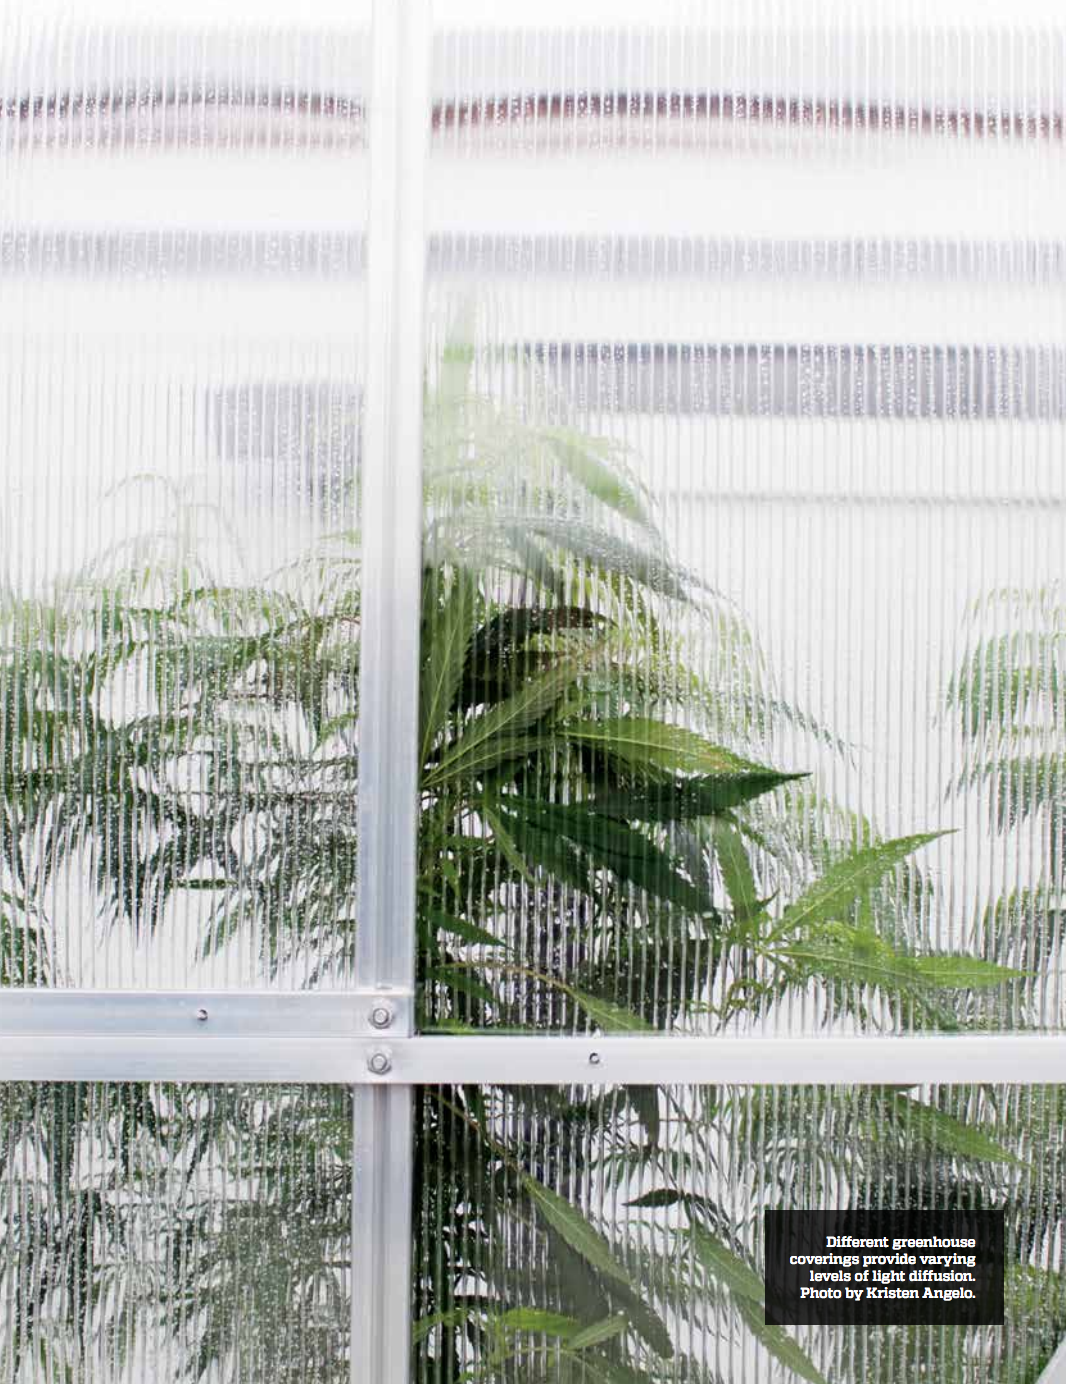 Sungrower & Greenhouse, Summer 2017